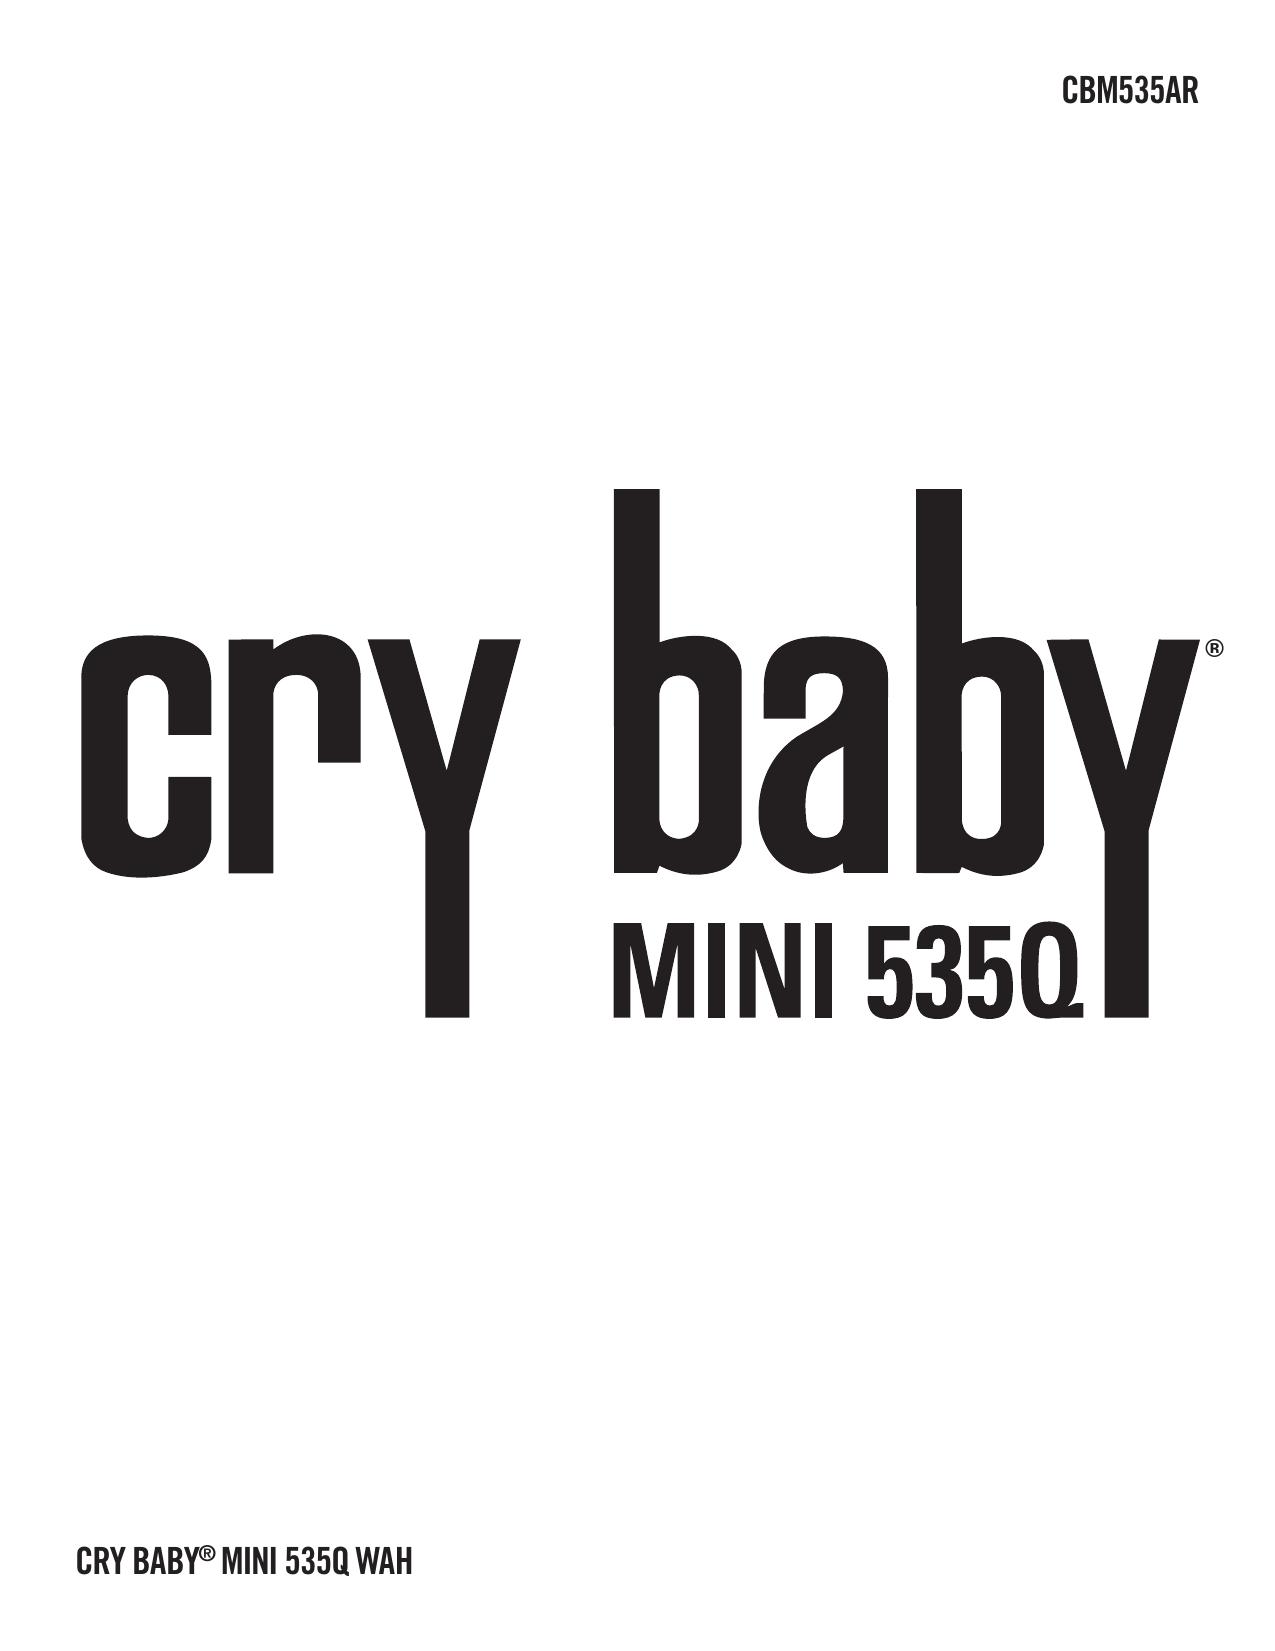 Dunlop CBM535AR CRYBABY Q MINI 535Q AUTO-RETURN WAH Manual